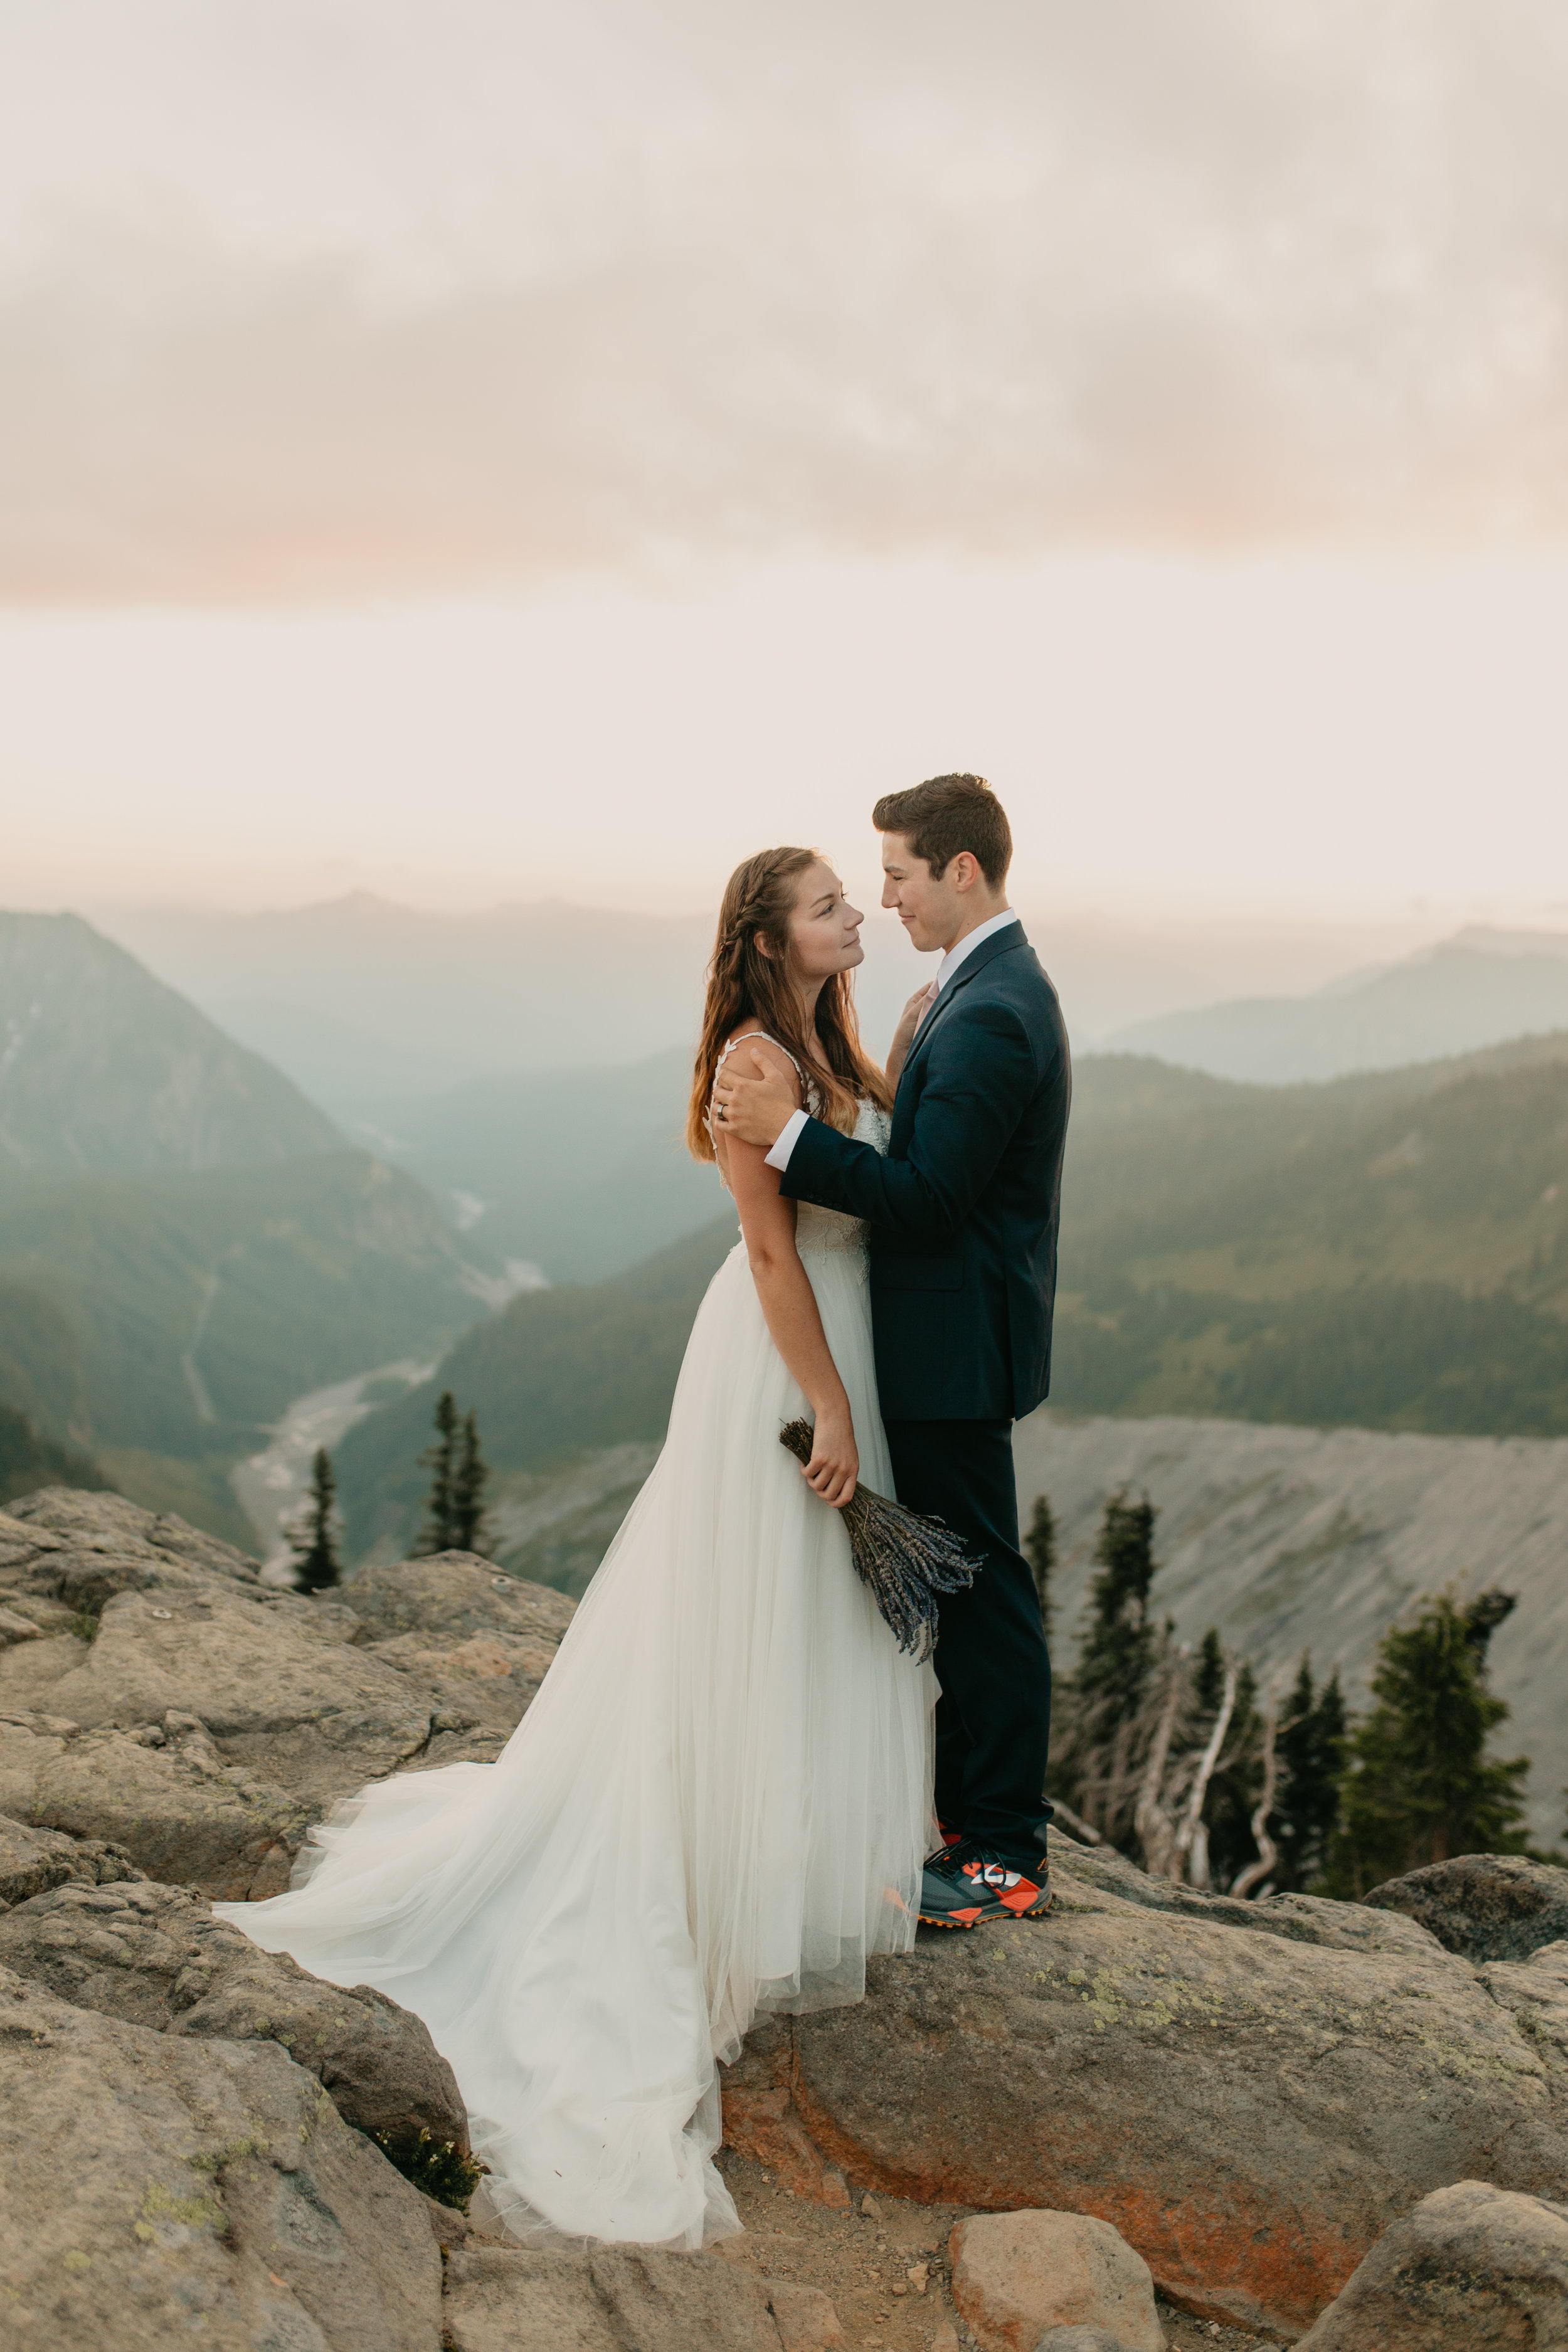 Nicole-Daacke-Photography-Mt-Rainier-elopement-photographer-washington-mountain-epic-wedding-photography-wildflowers-at-rainier-pine-tree-cloudy-summer-day-at-mountain-rainier-53.jpg